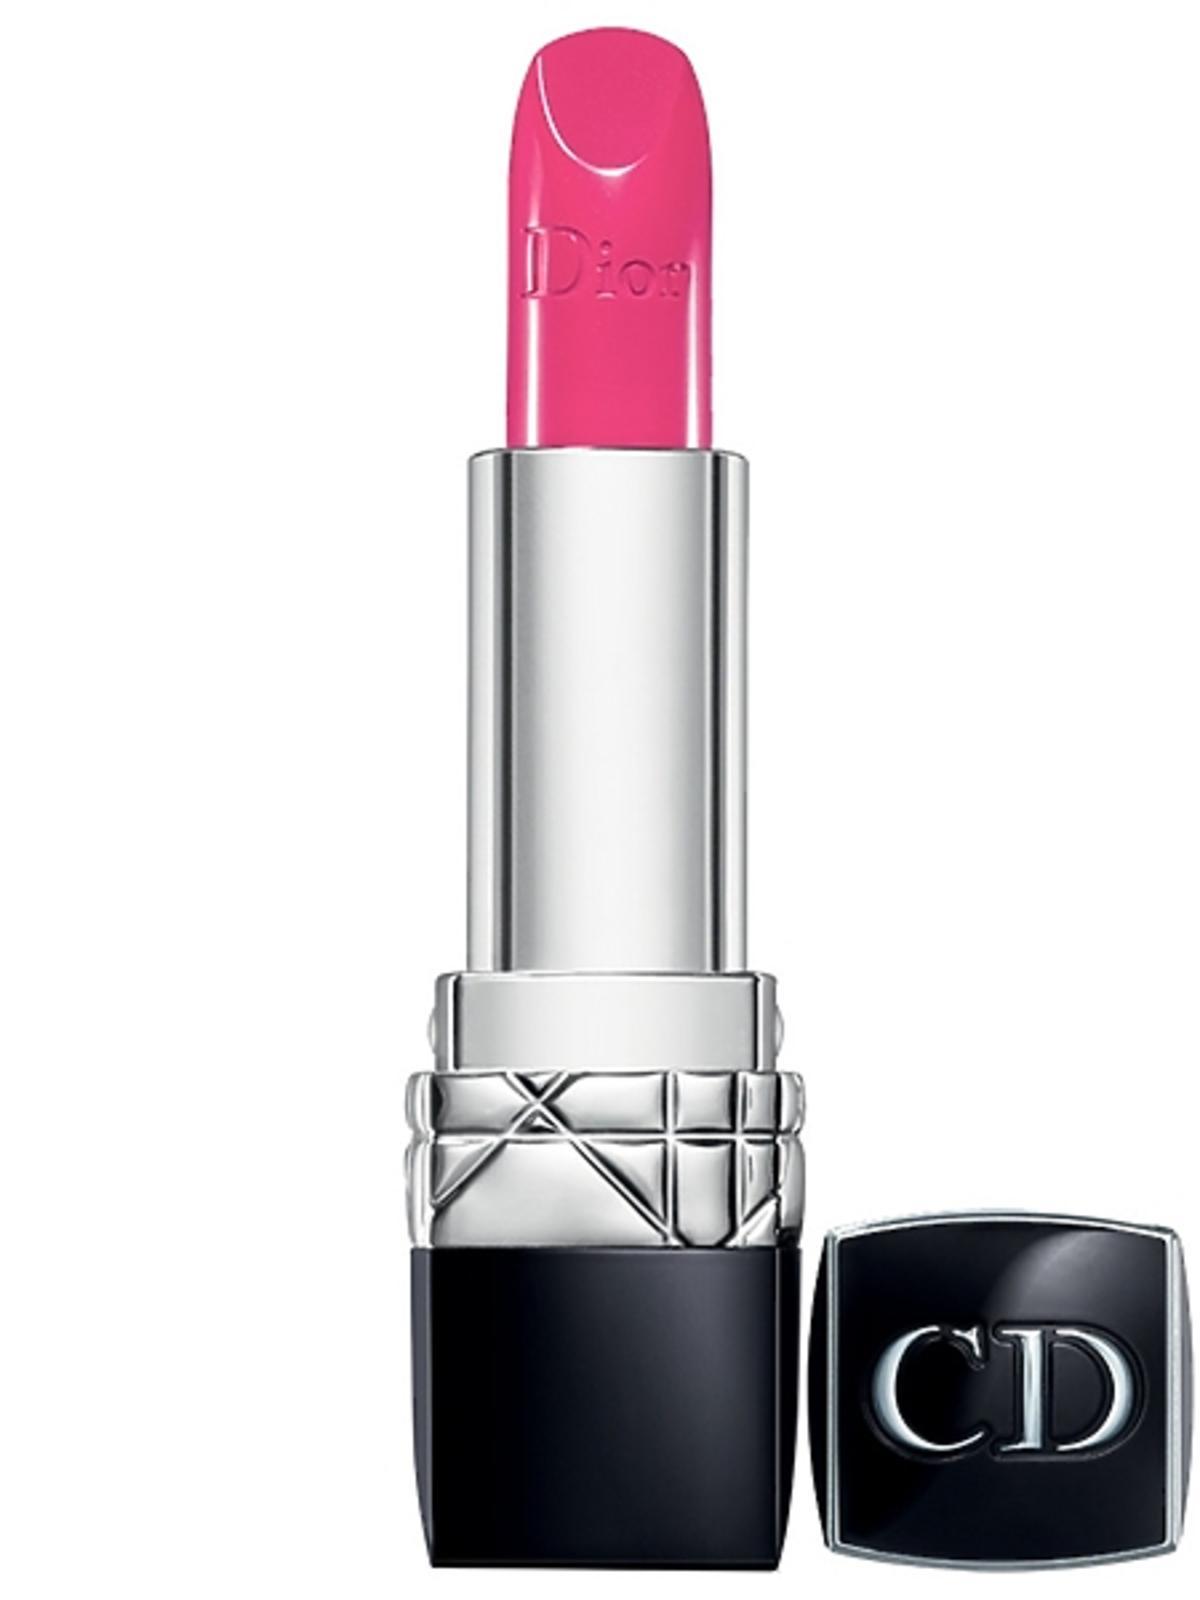 Różowa szminka do ust Dior ( Deauville - 671), cena